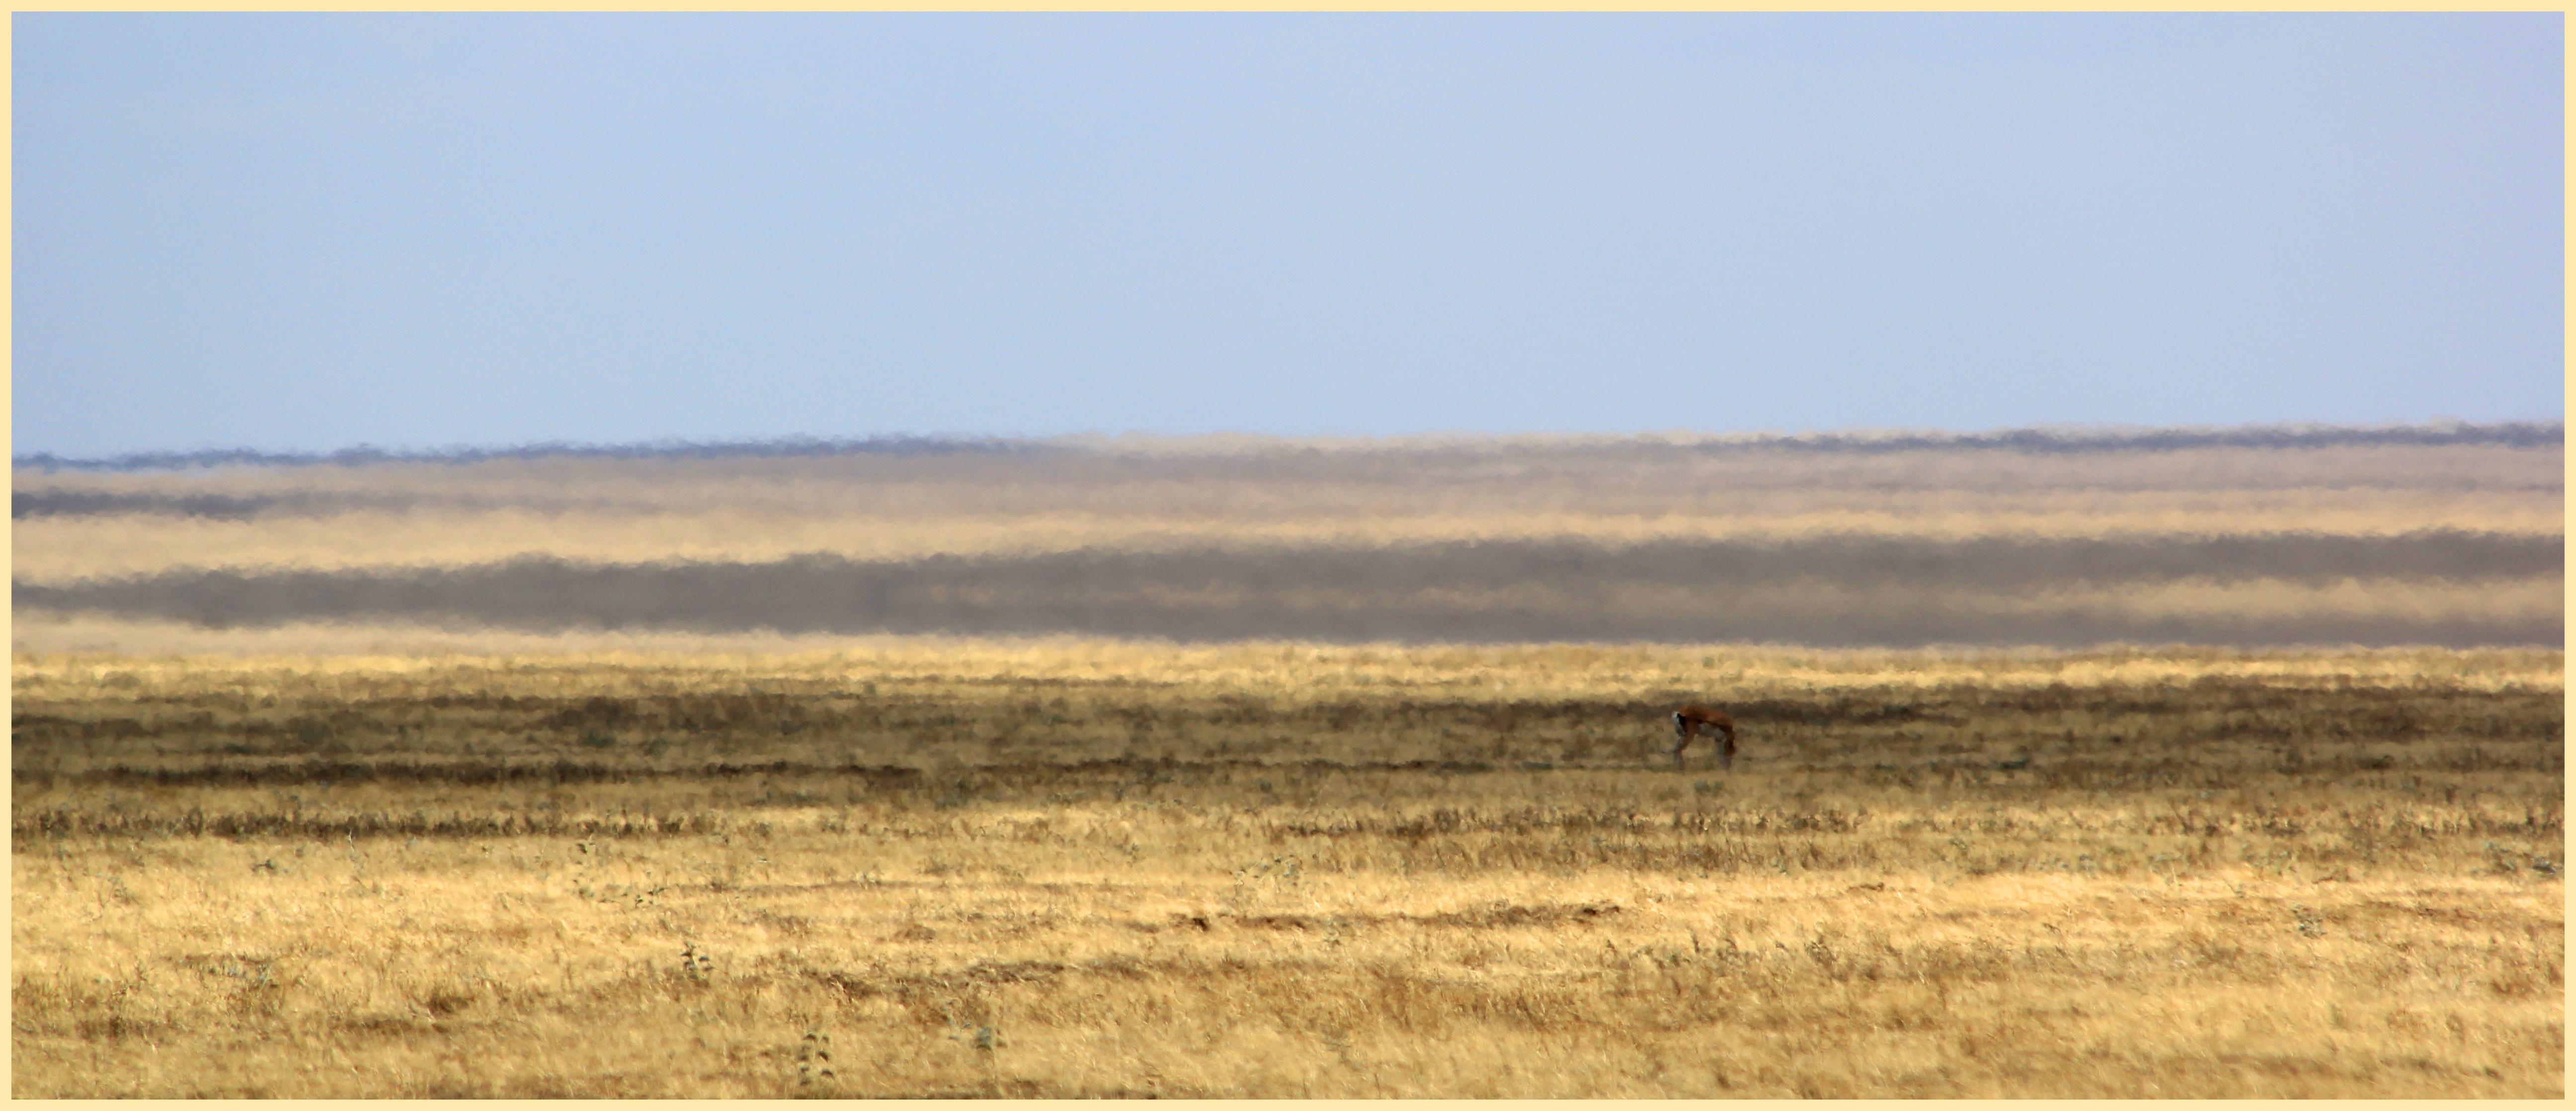 Safari: Part III – The endless plain: Serengeti | iago80